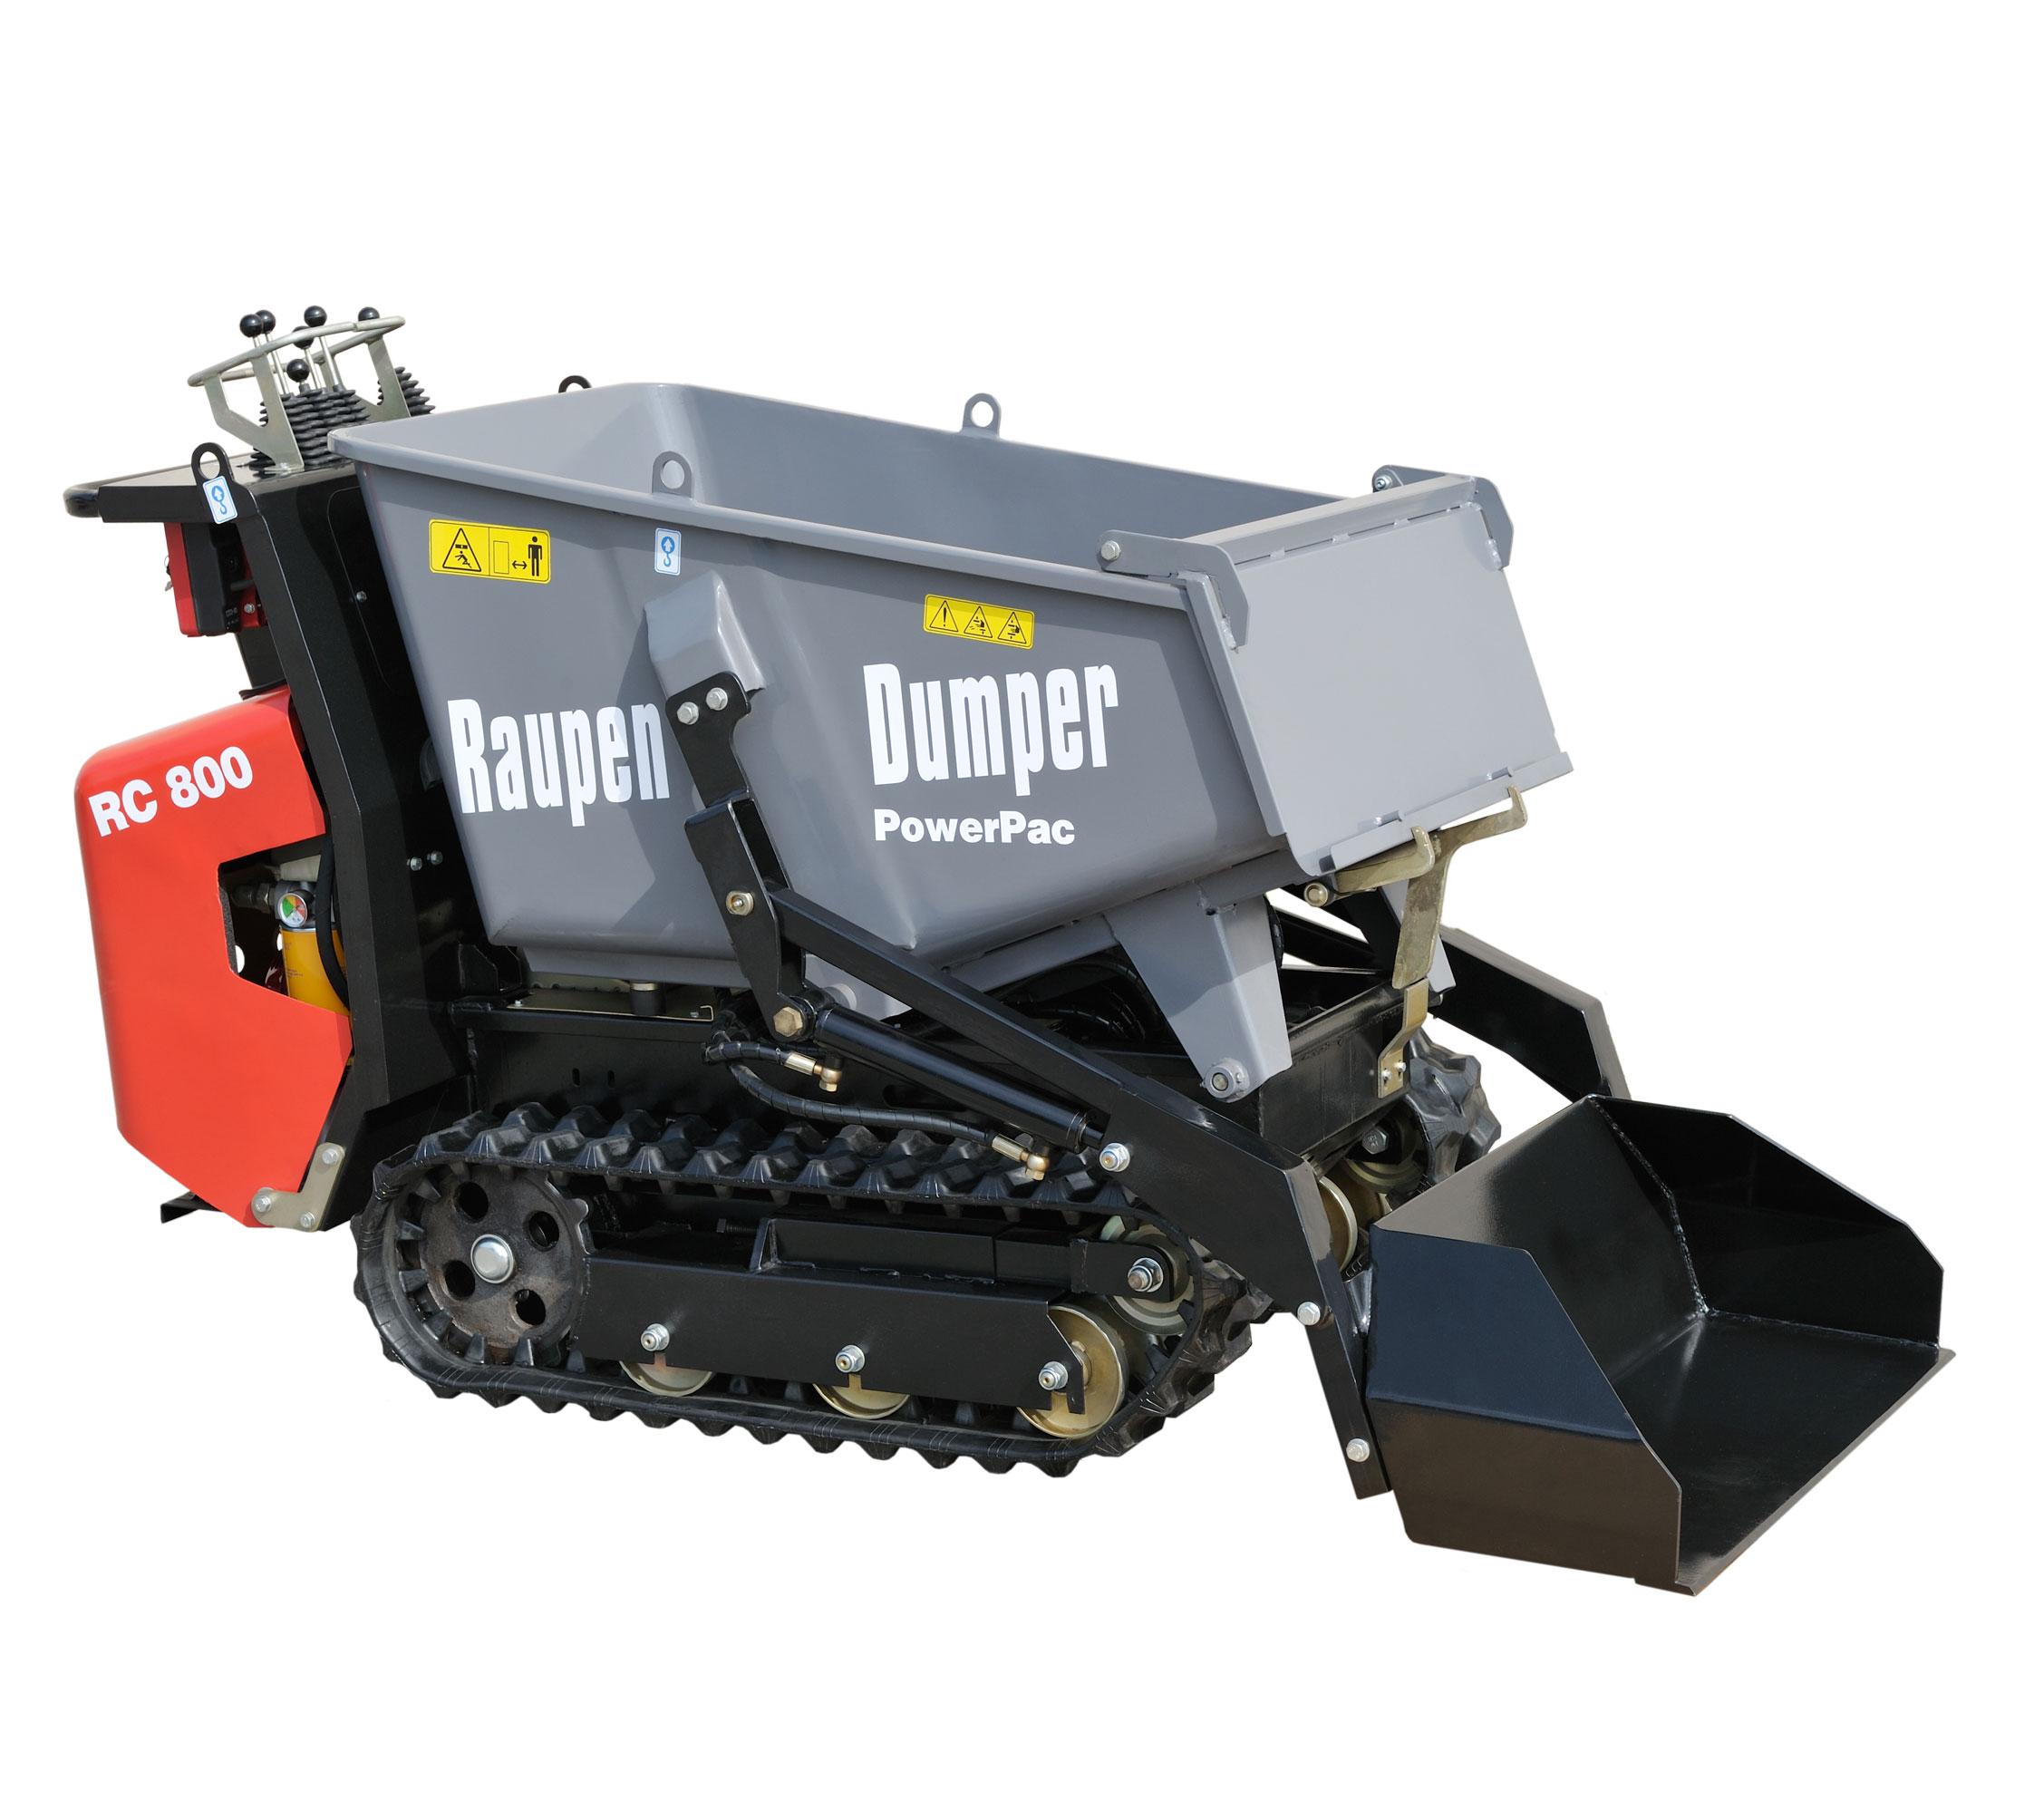 Powerpac Raupen-Dumper RC 800 Bild 1